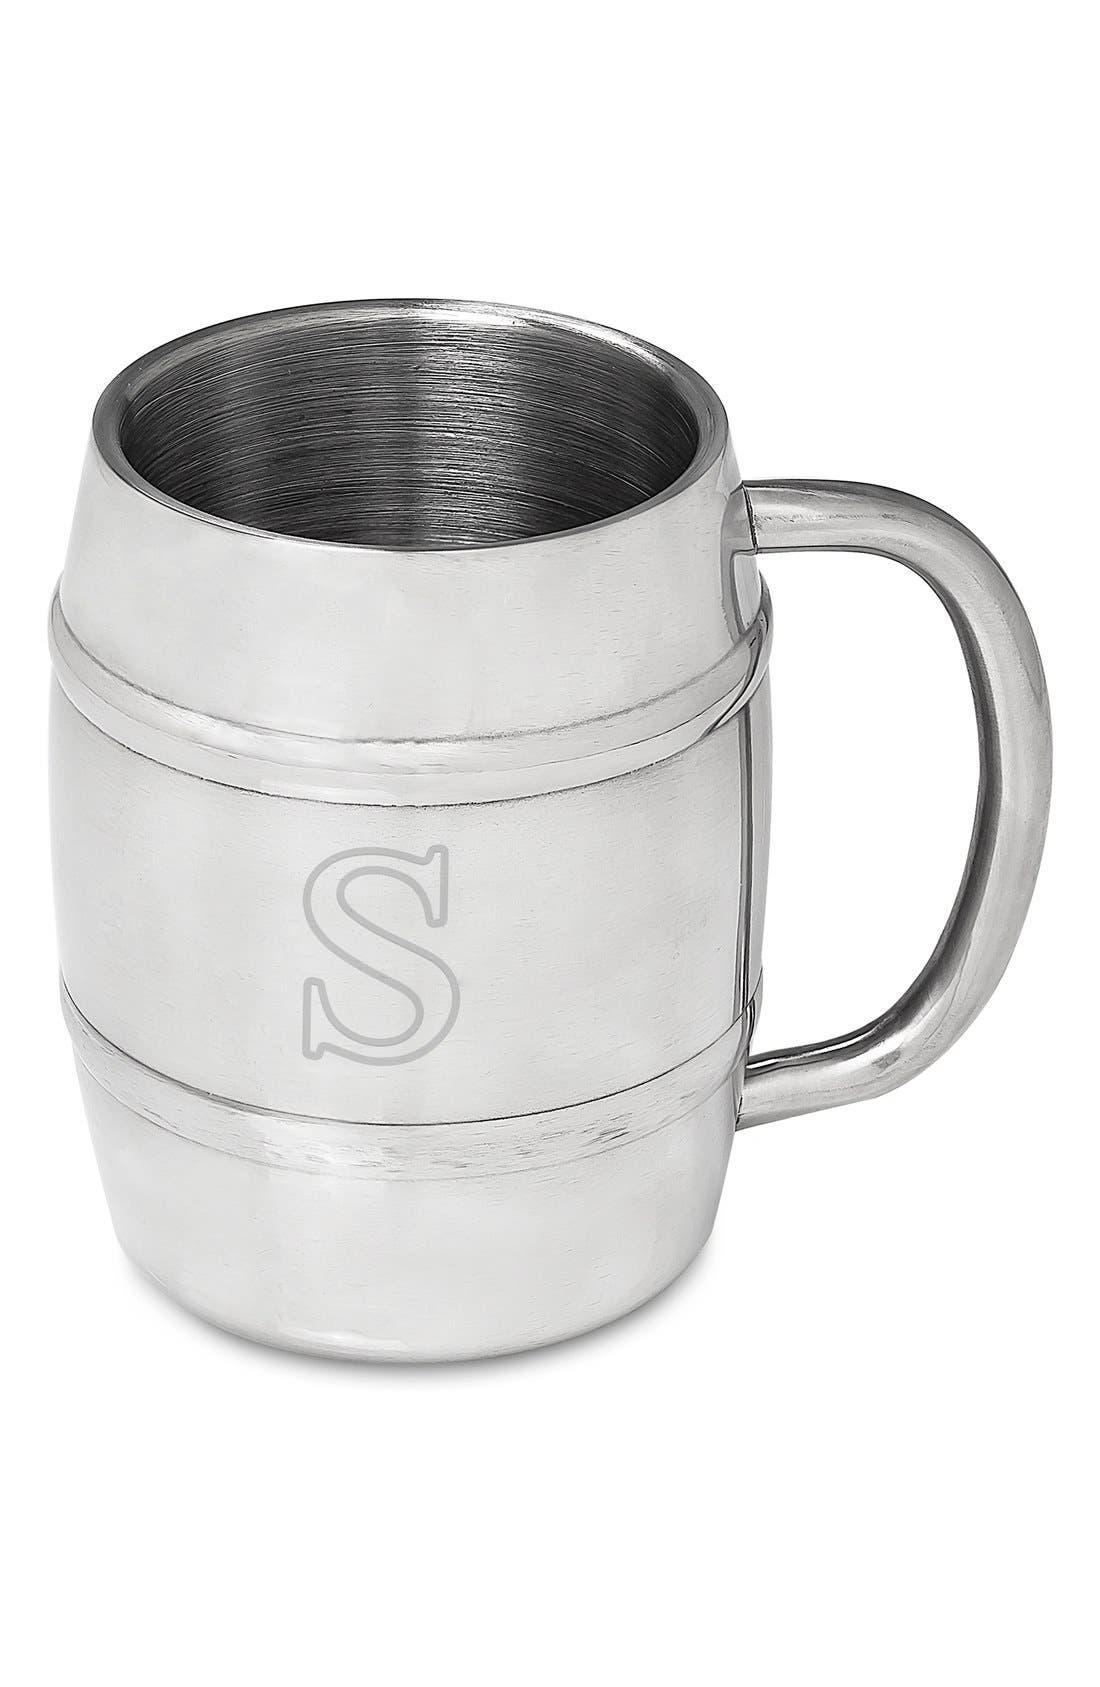 Monogram Stainless Steel Keg Mug,                             Main thumbnail 21, color,